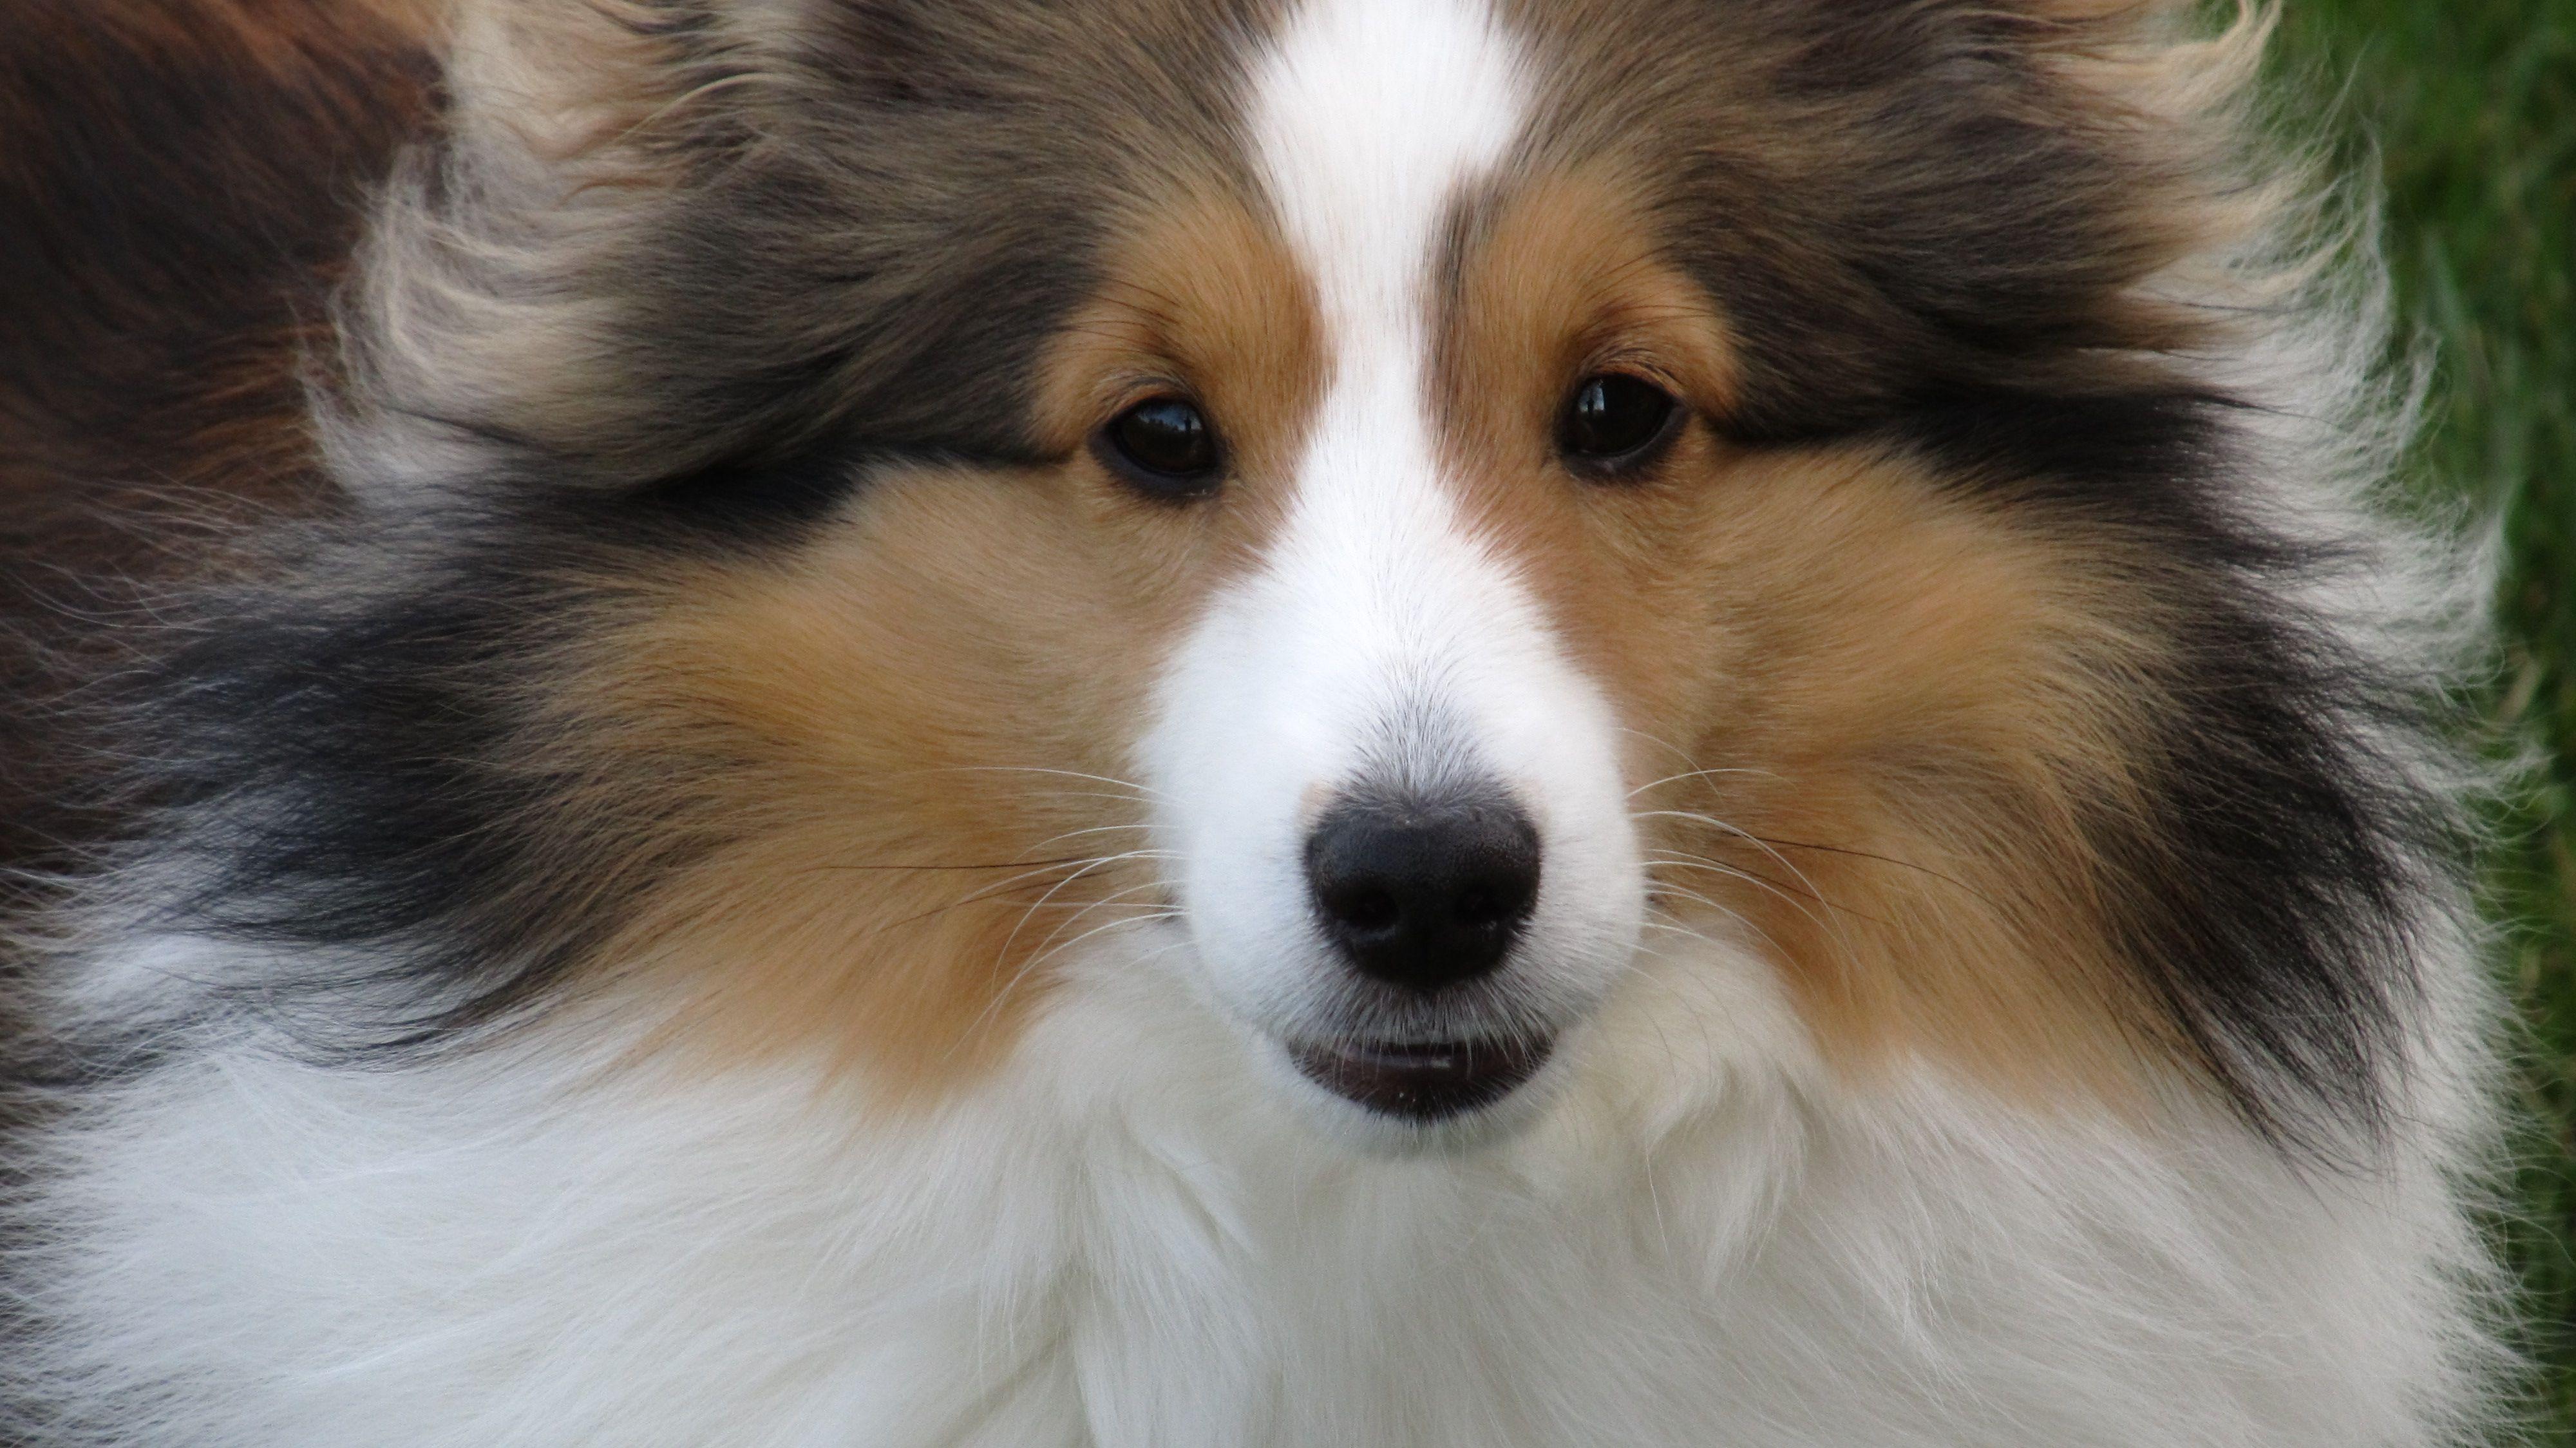 sheltie Sheltie dogs, Shetland sheepdog, Collie dog